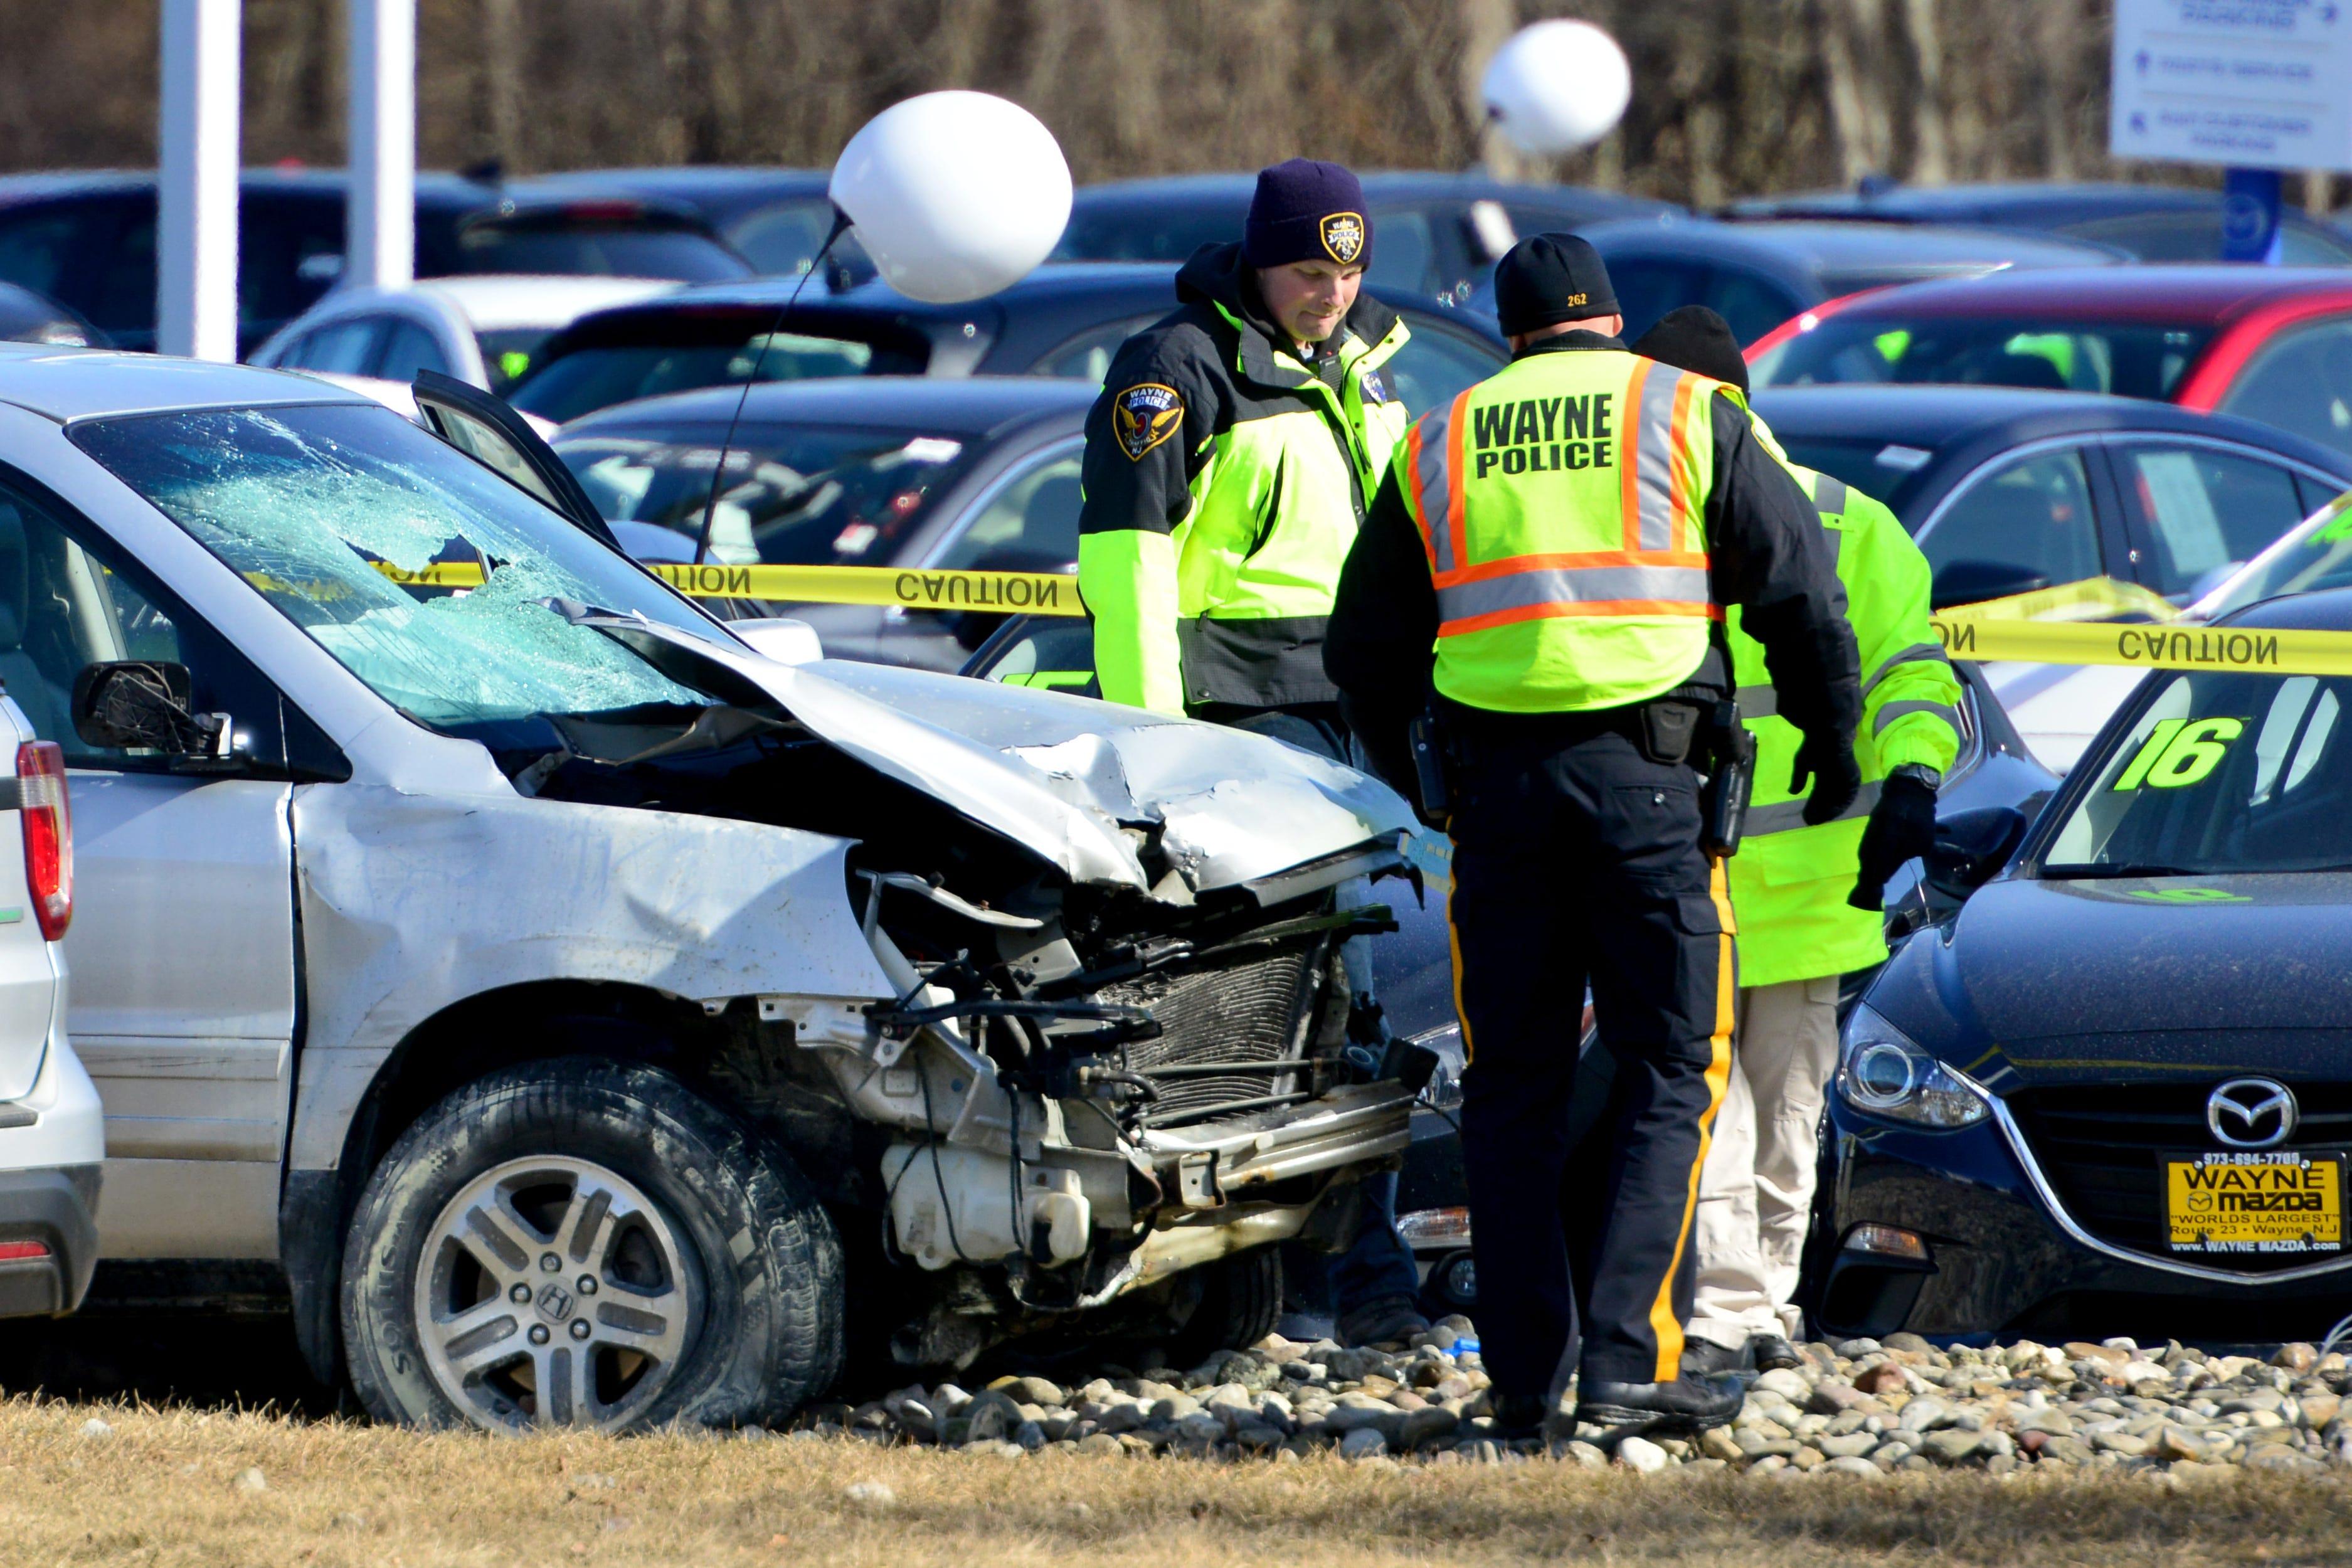 Three dead in Multi-car crash at gas station on Rt  23 in Wayne